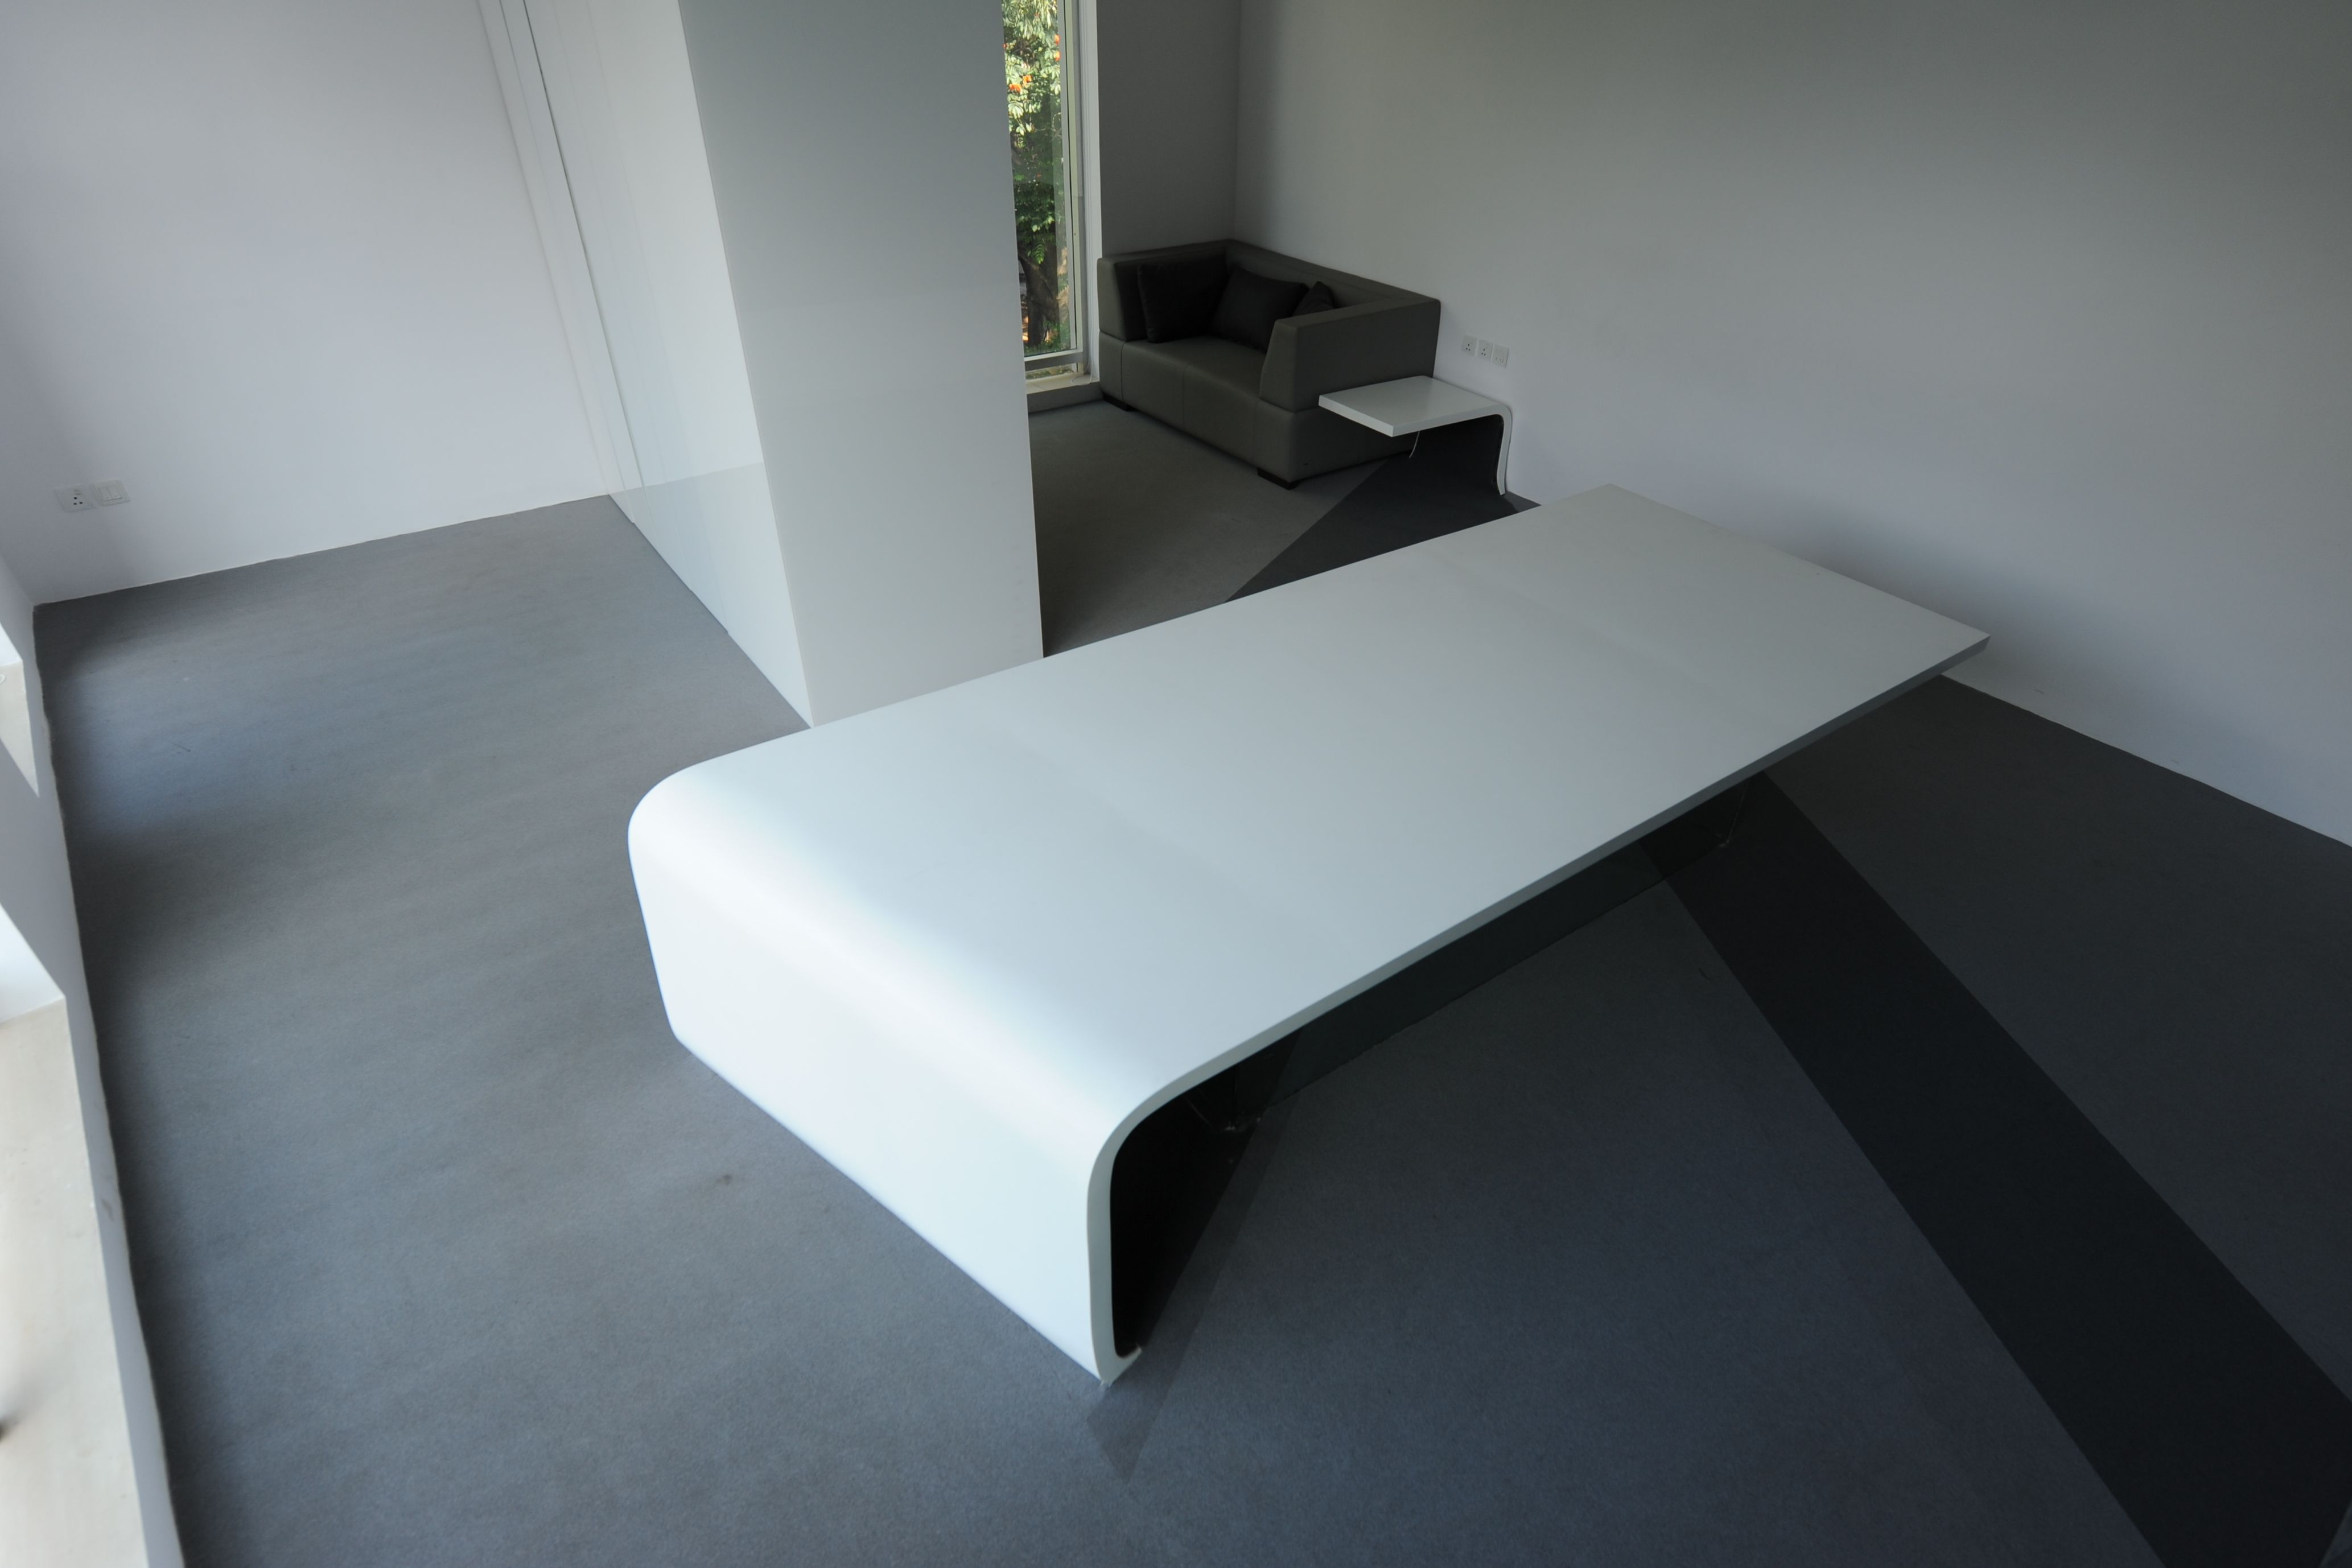 Tavolo Corian ~ White corian office table office table workspace modern